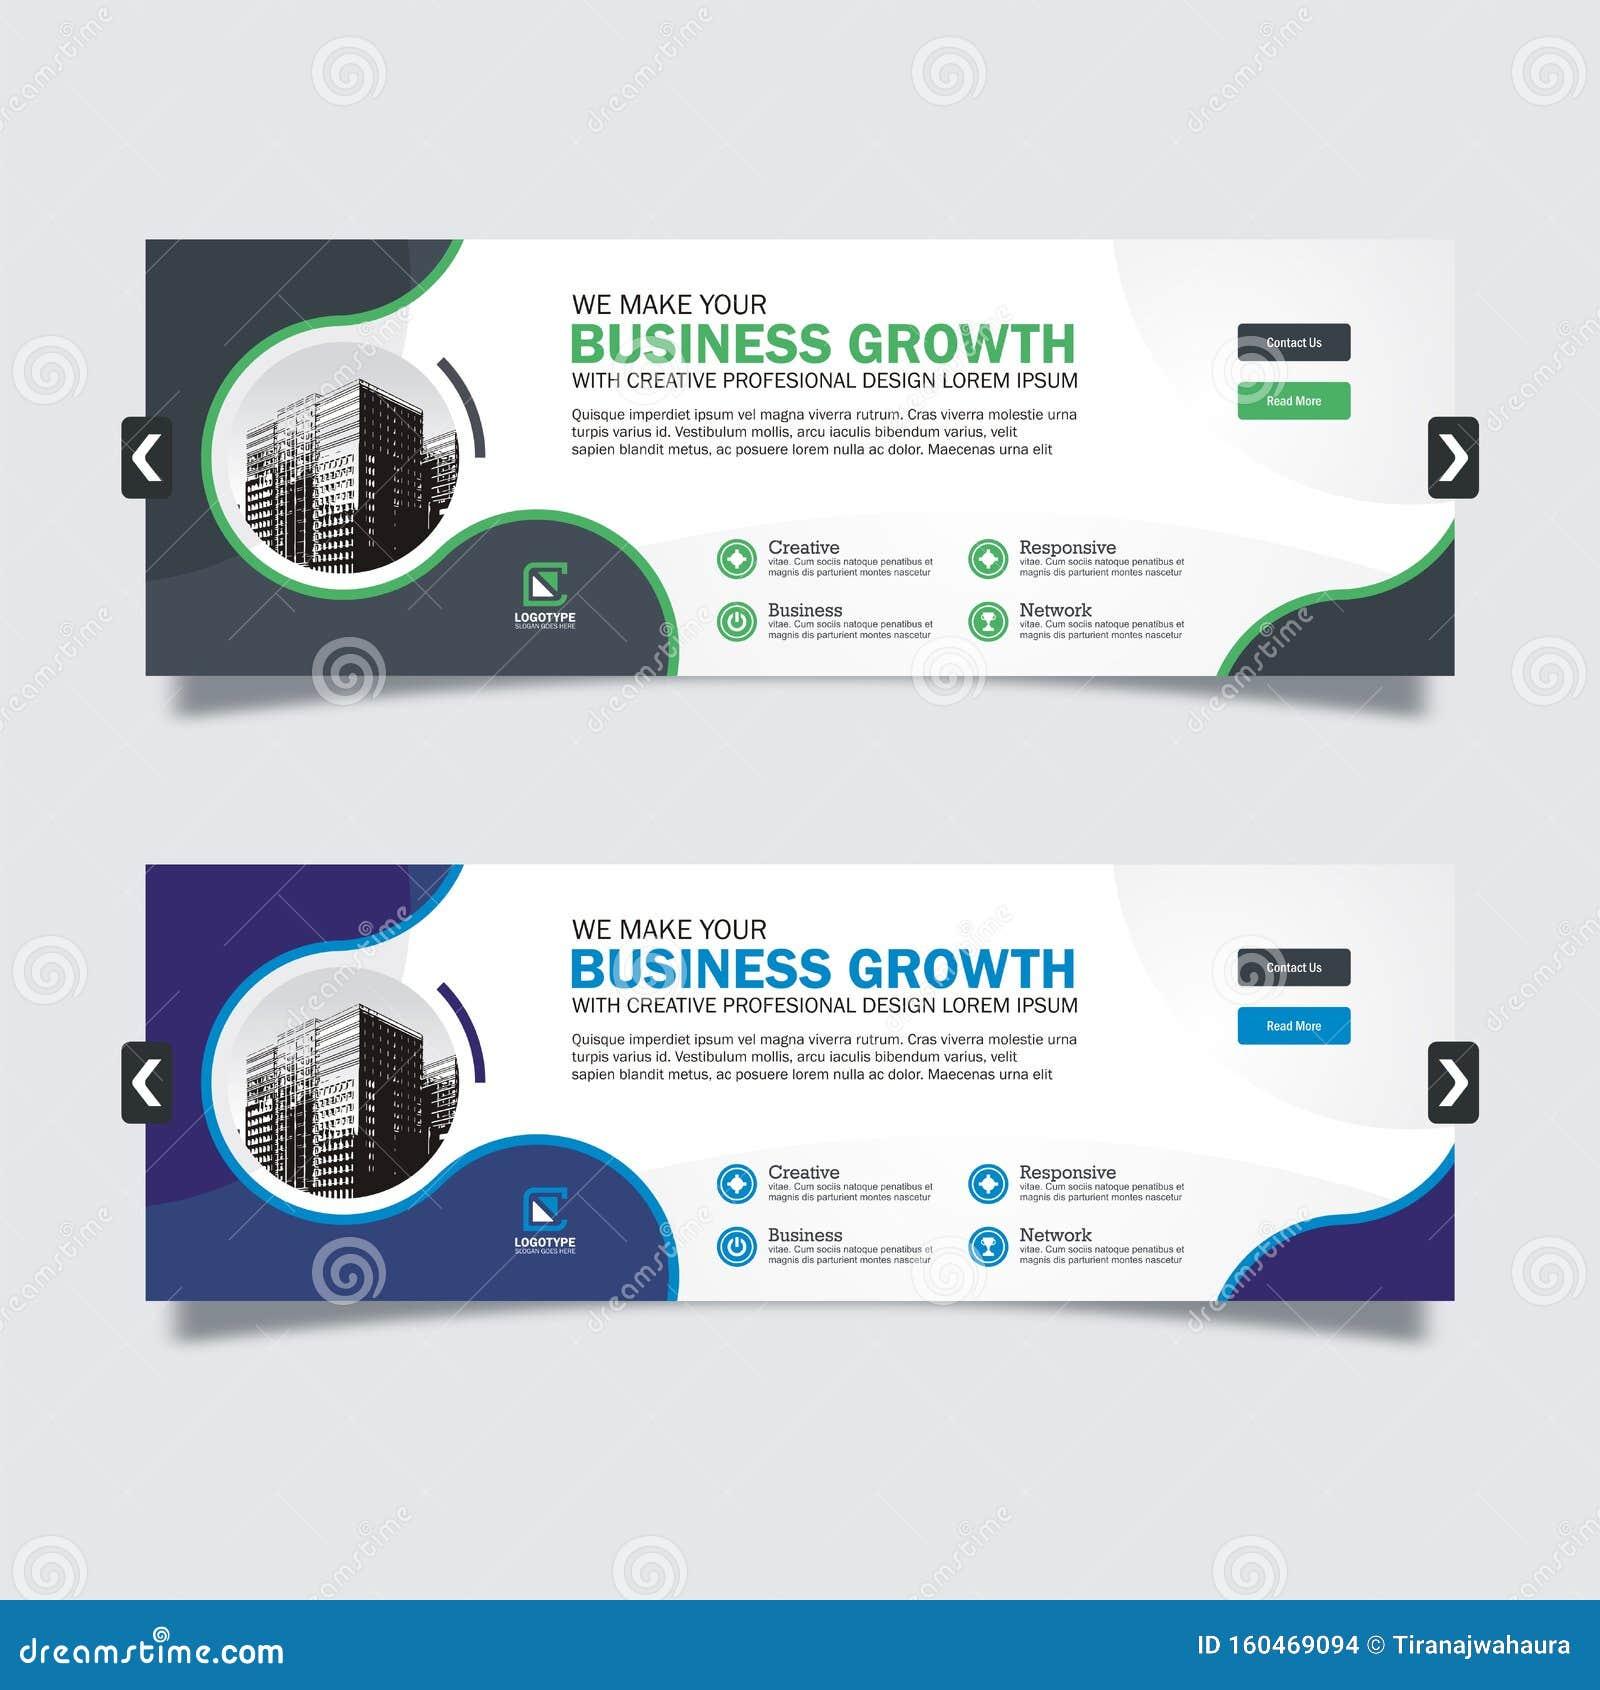 Business Slider Banner Design With Trendy And Modern Design Stock Vector -  Illustration Of 2020, Marketing: 160469094